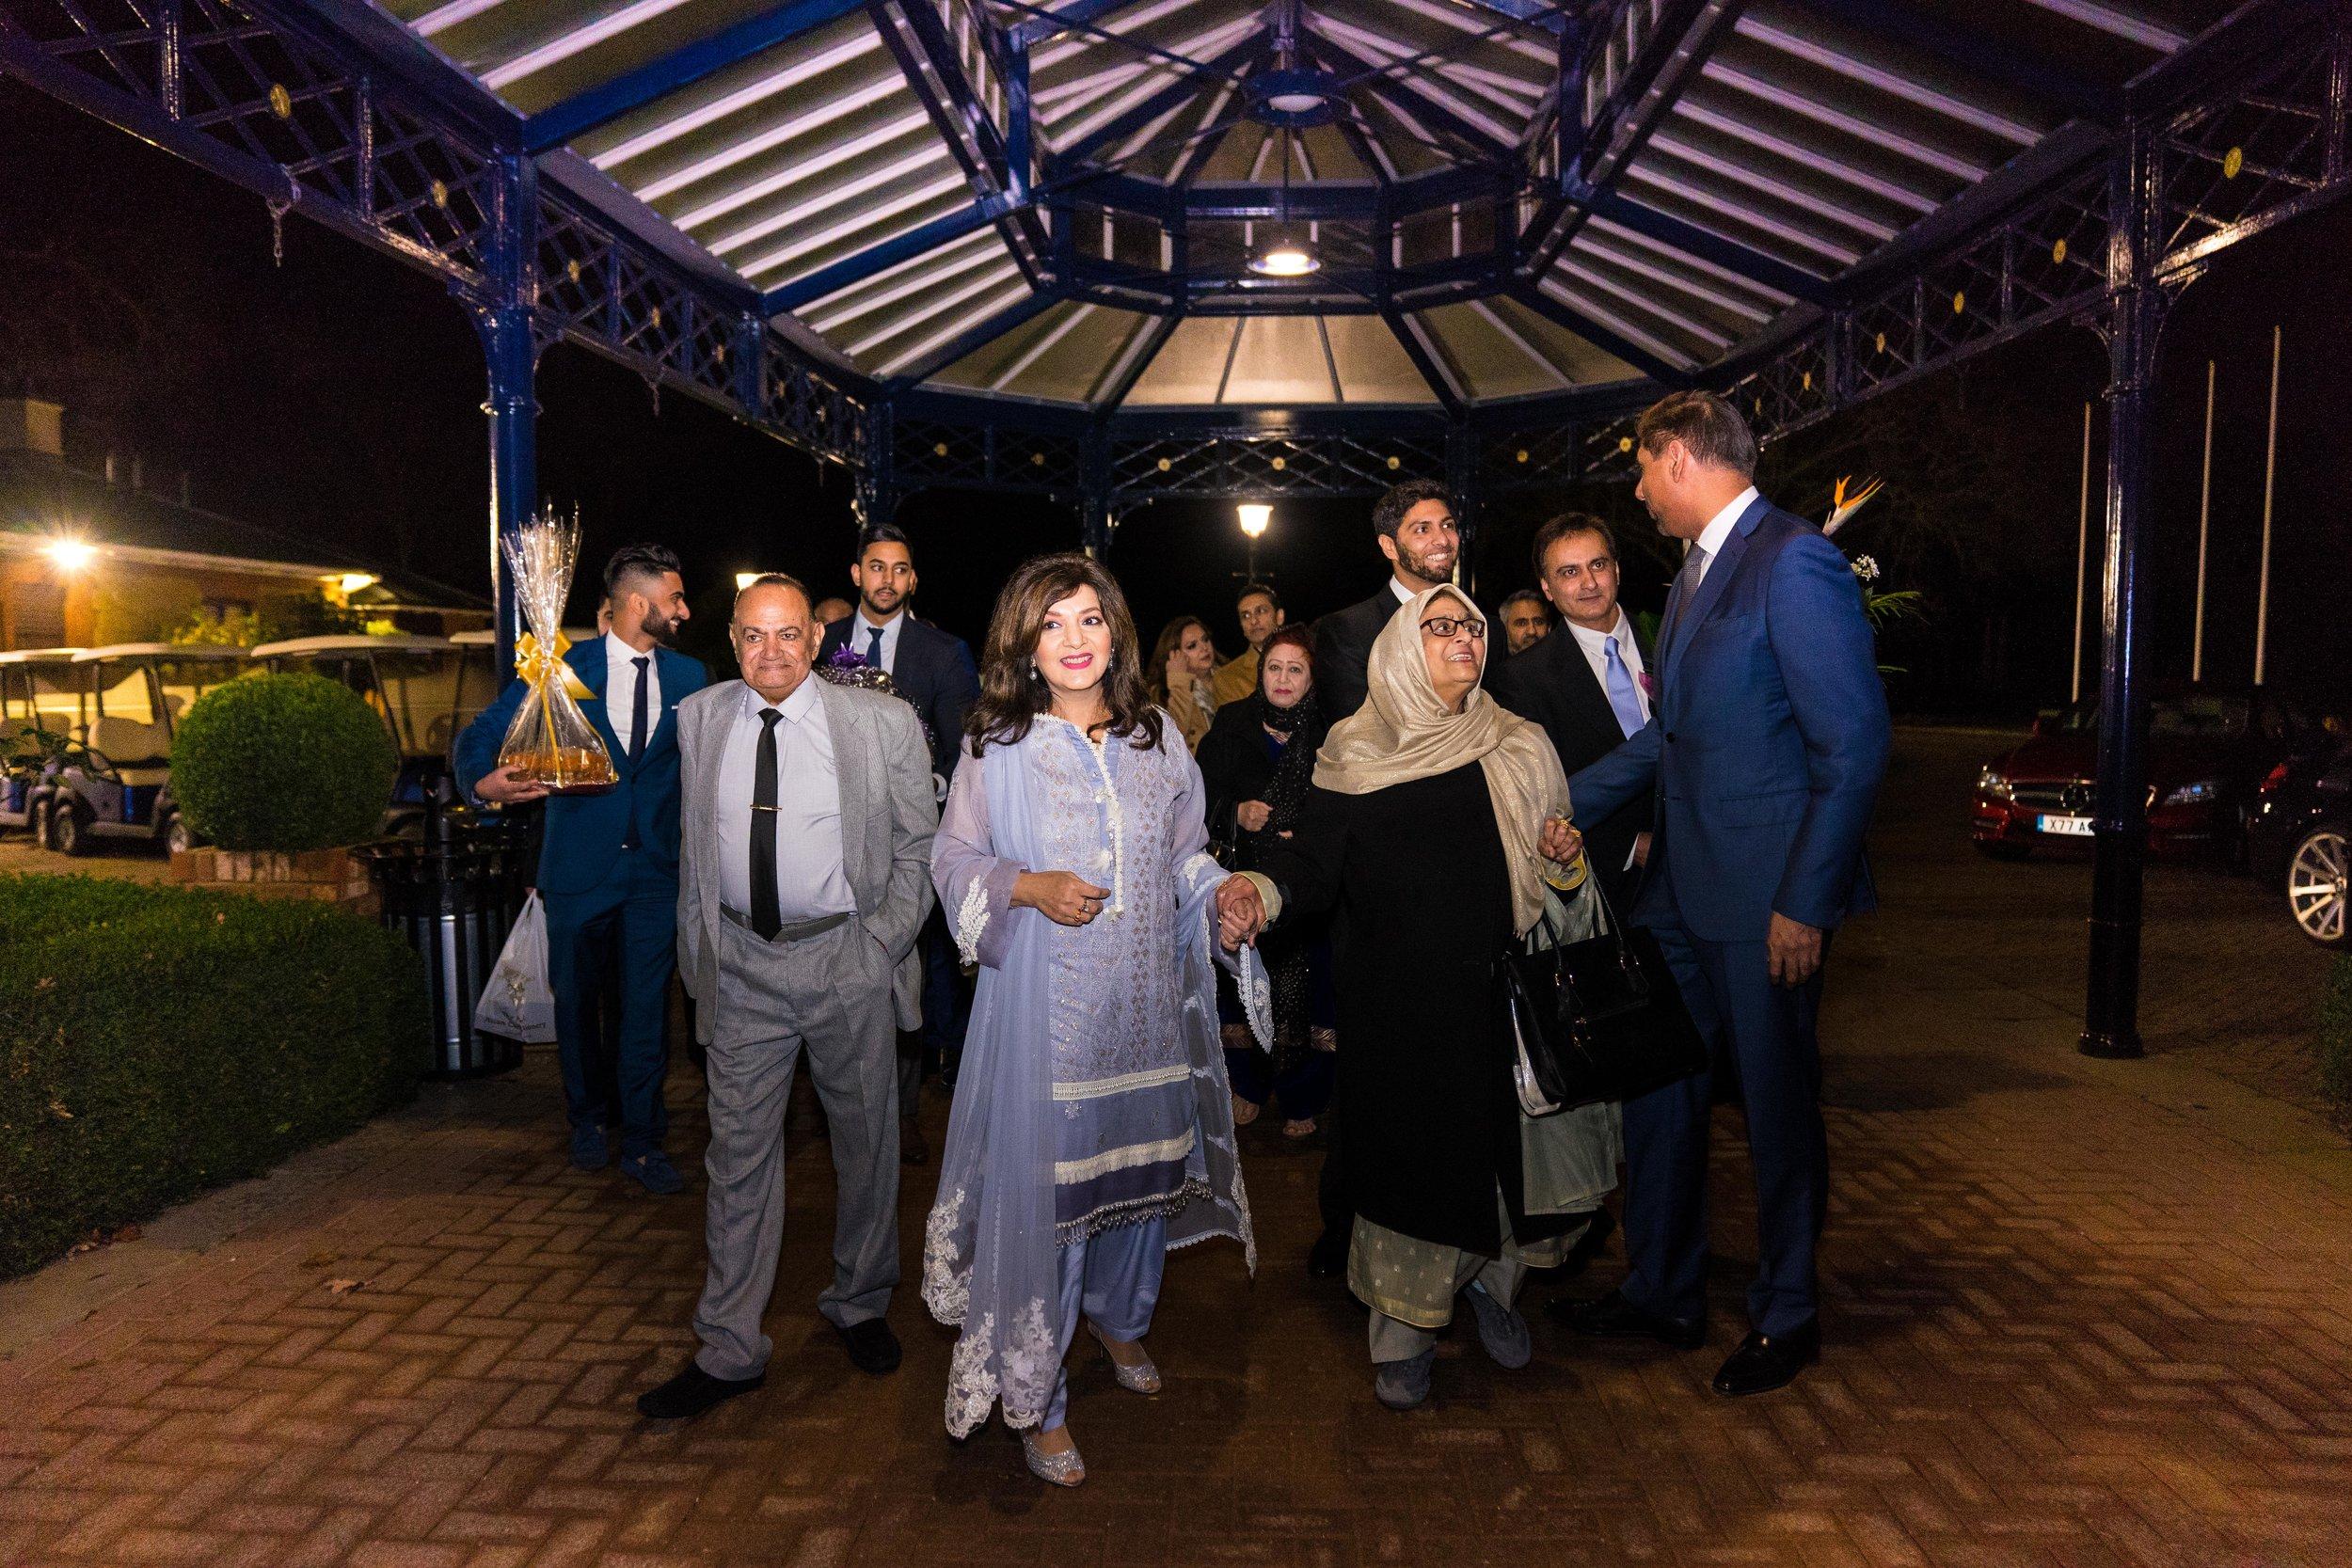 buckinghamshire-golf-club-winter-muslim-wedding-engagement-photography-videography-09